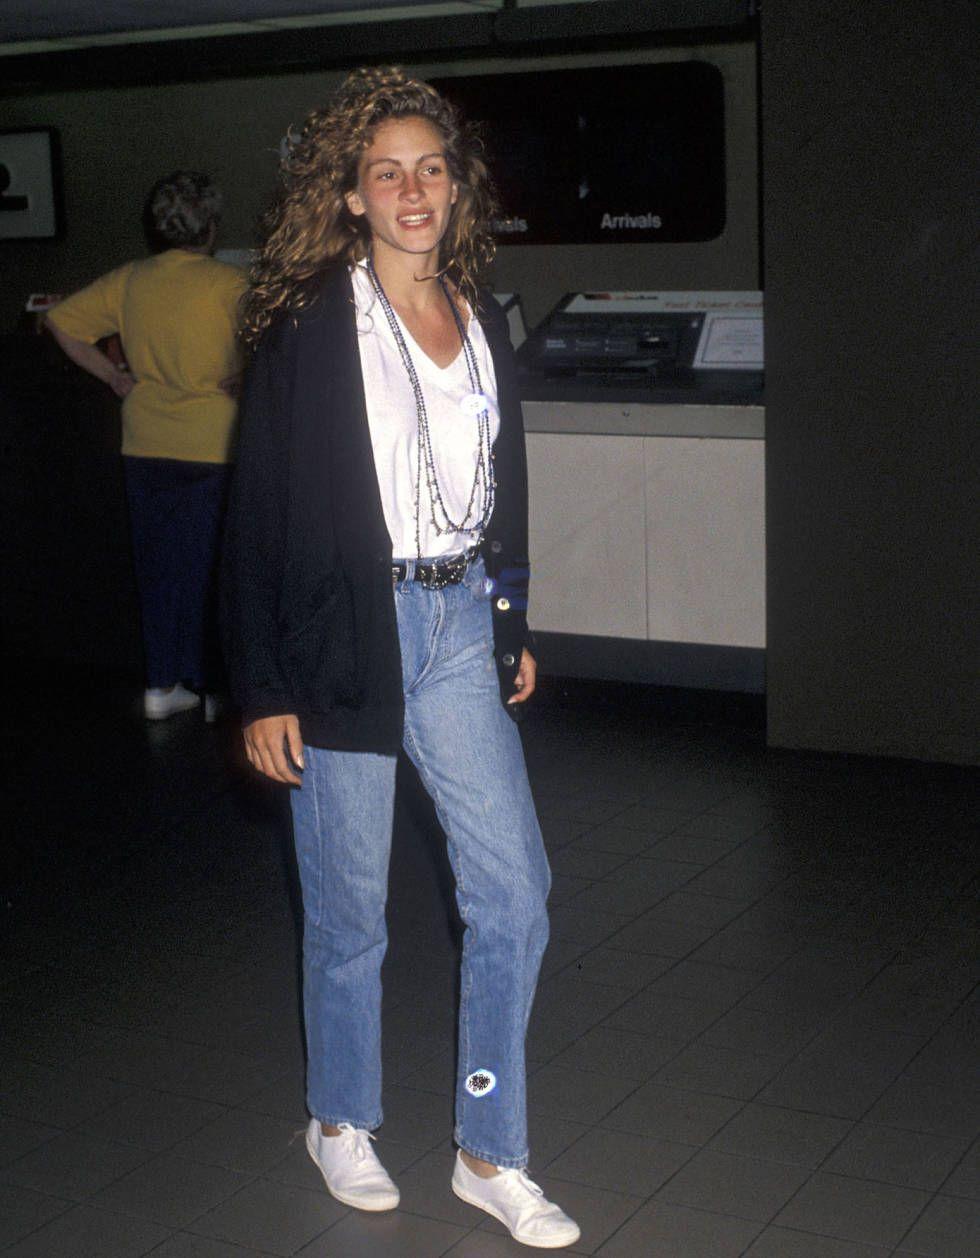 JULIA ROBERTS 1990S STYLE - Google Search | nineties ...